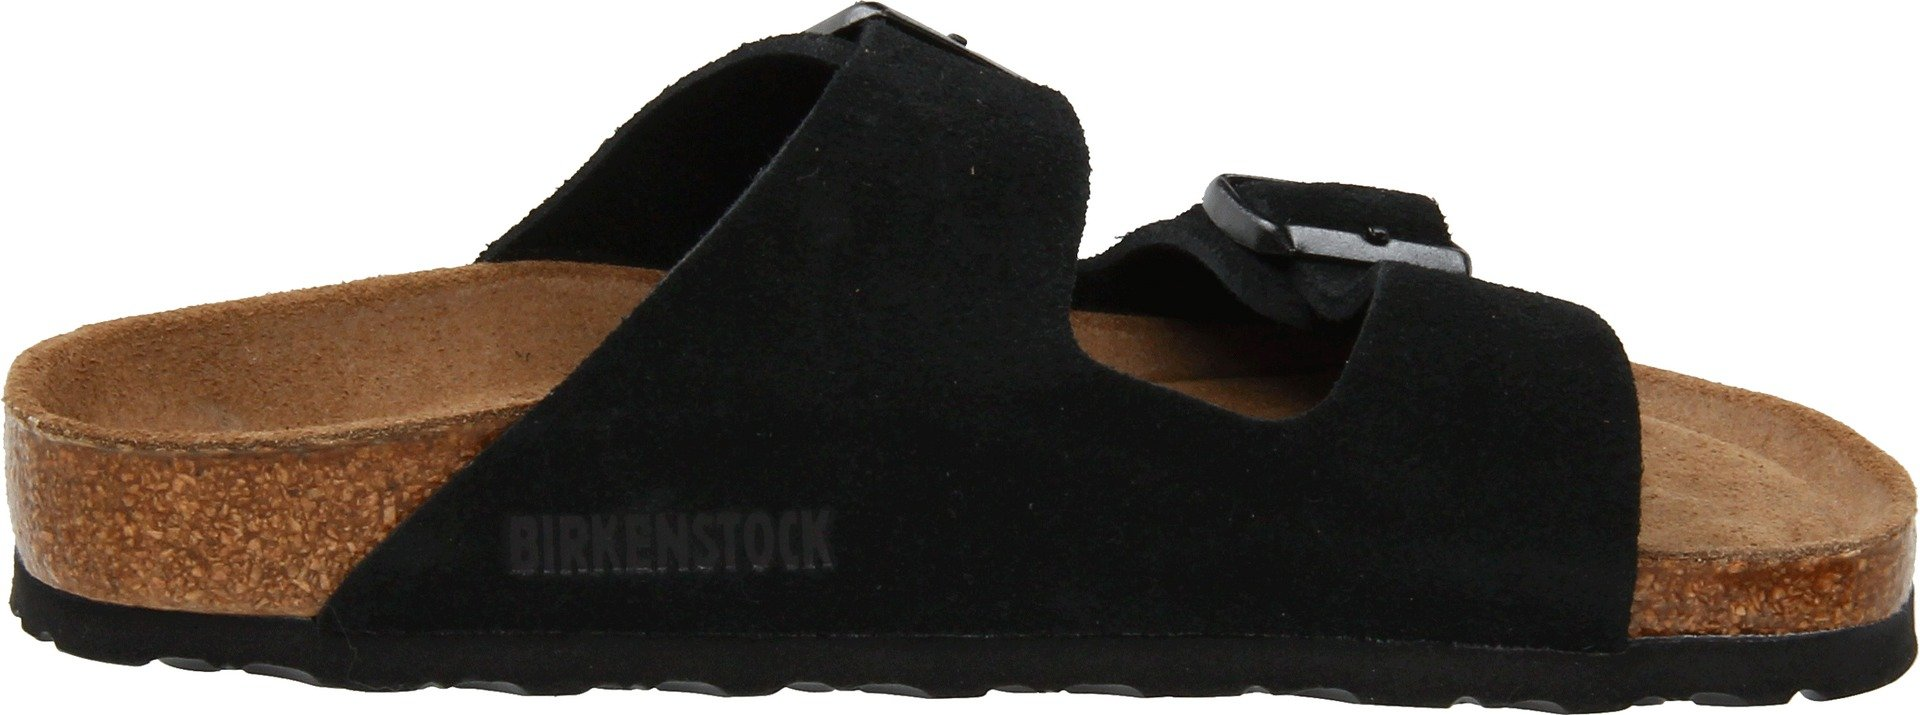 Birkenstock Arizona Soft Footbed Black Suede Regular Width - EU Size 35 / Women's US Sizes 4-4.5 by Birkenstock (Image #6)